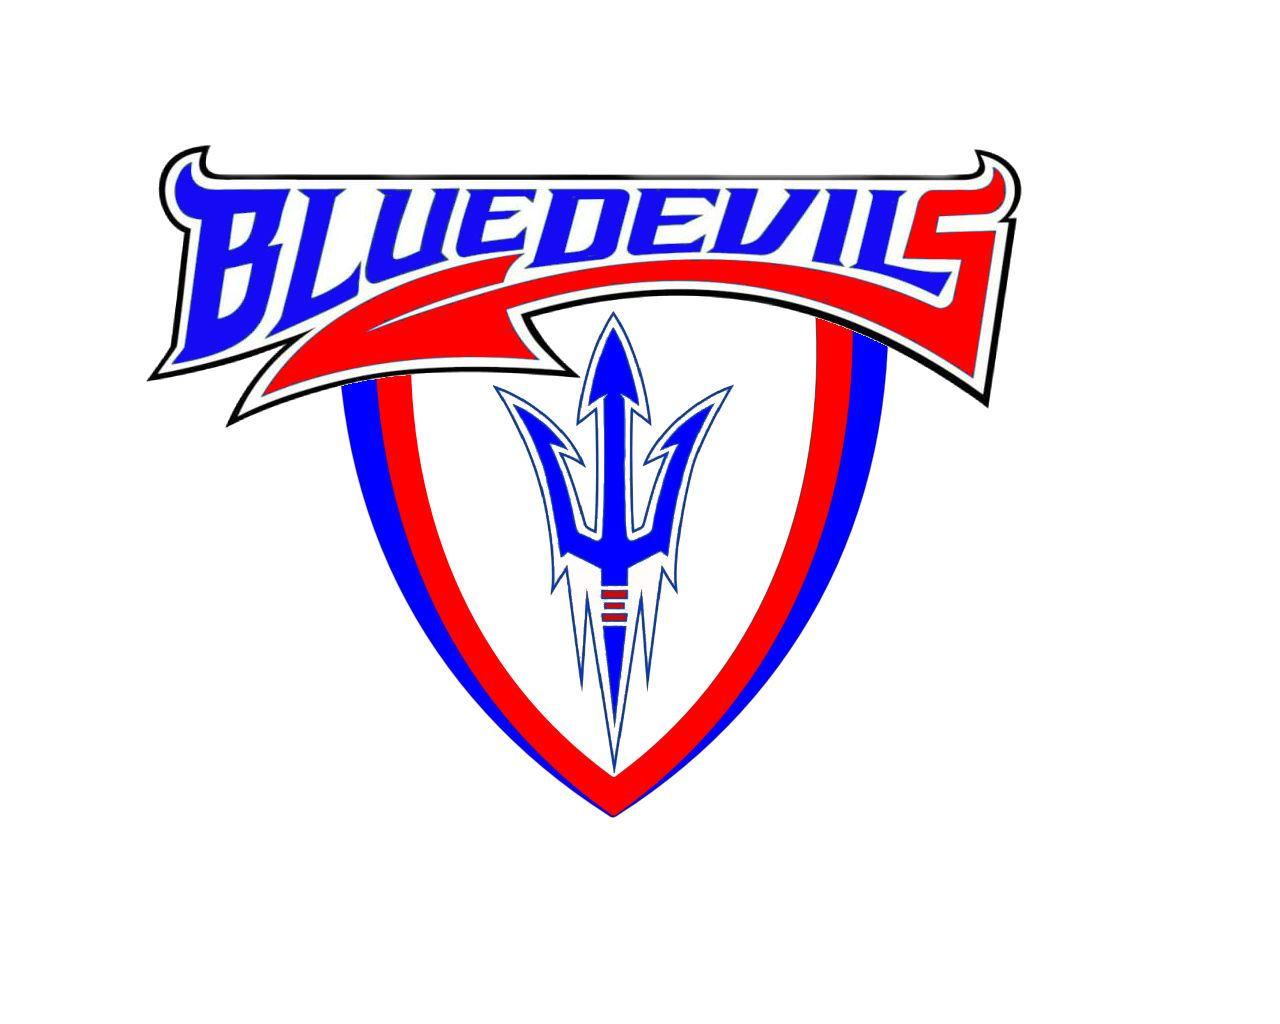 Springfield Blue Devils Seniors  - Springfield Blue Devils Seniors